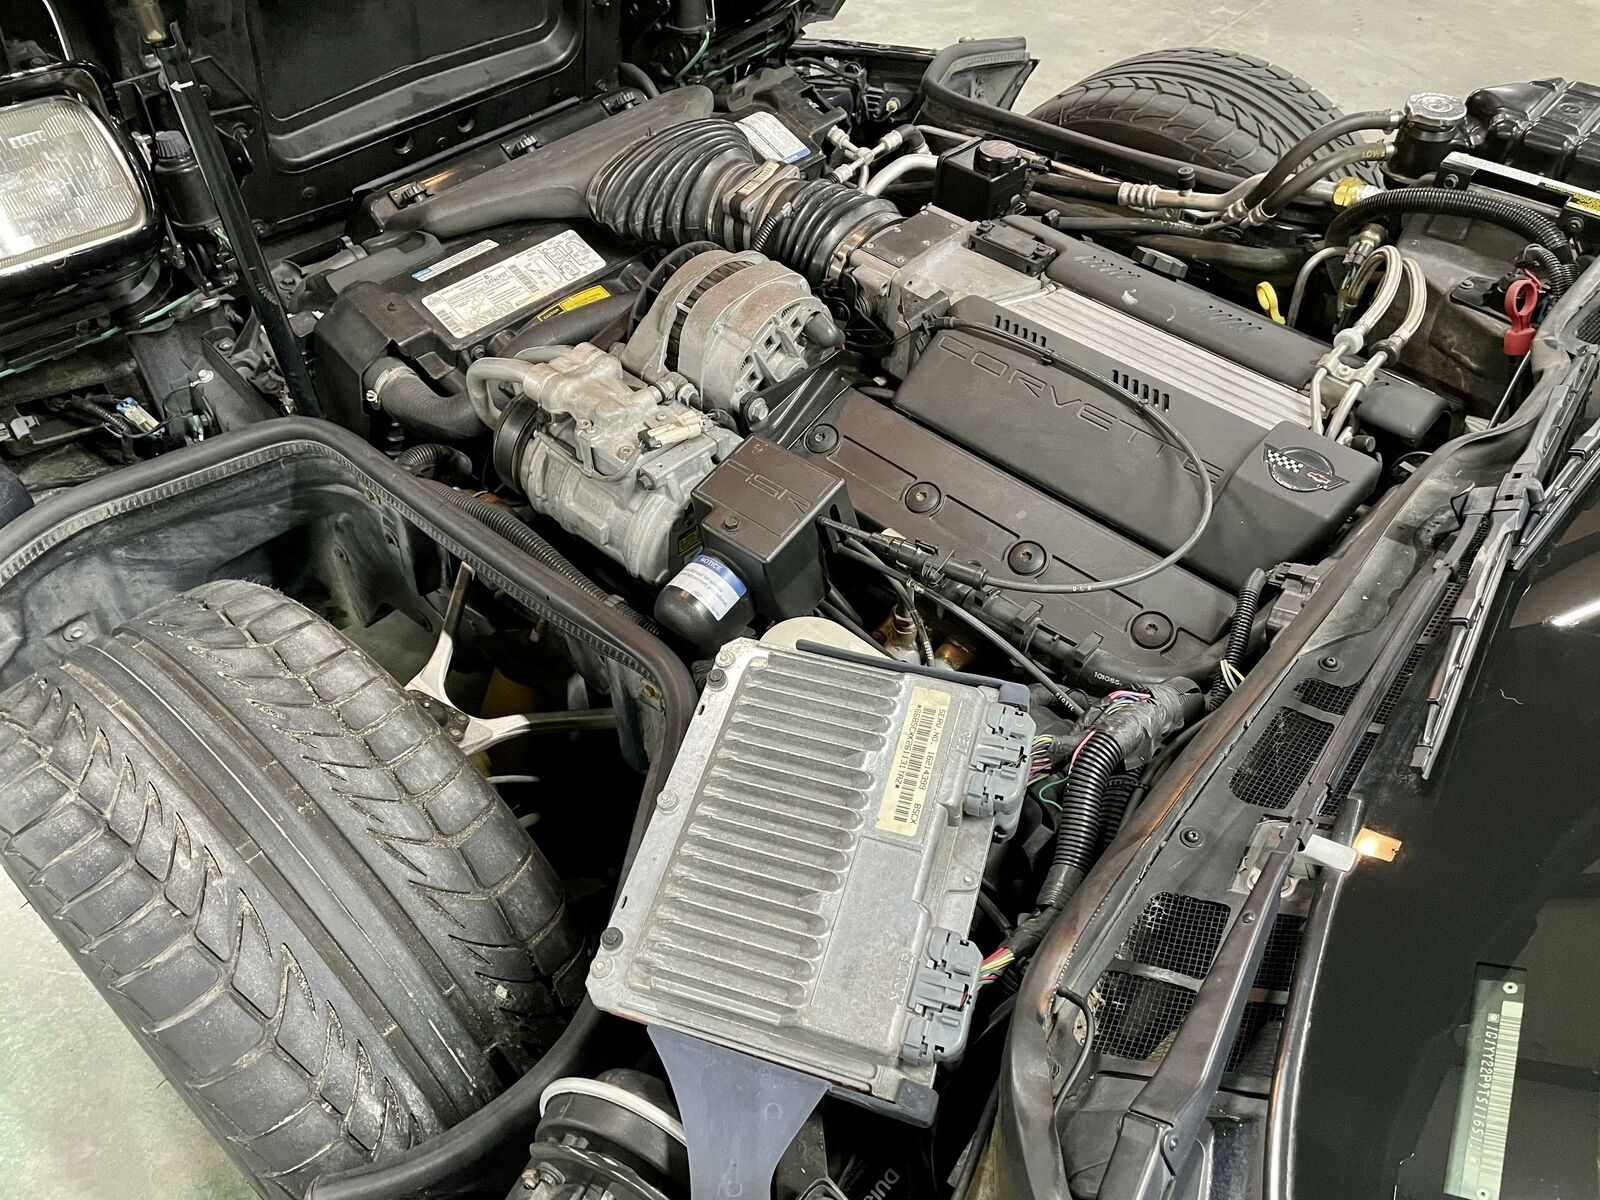 1996 Black Chevrolet Corvette     C4 Corvette Photo 9